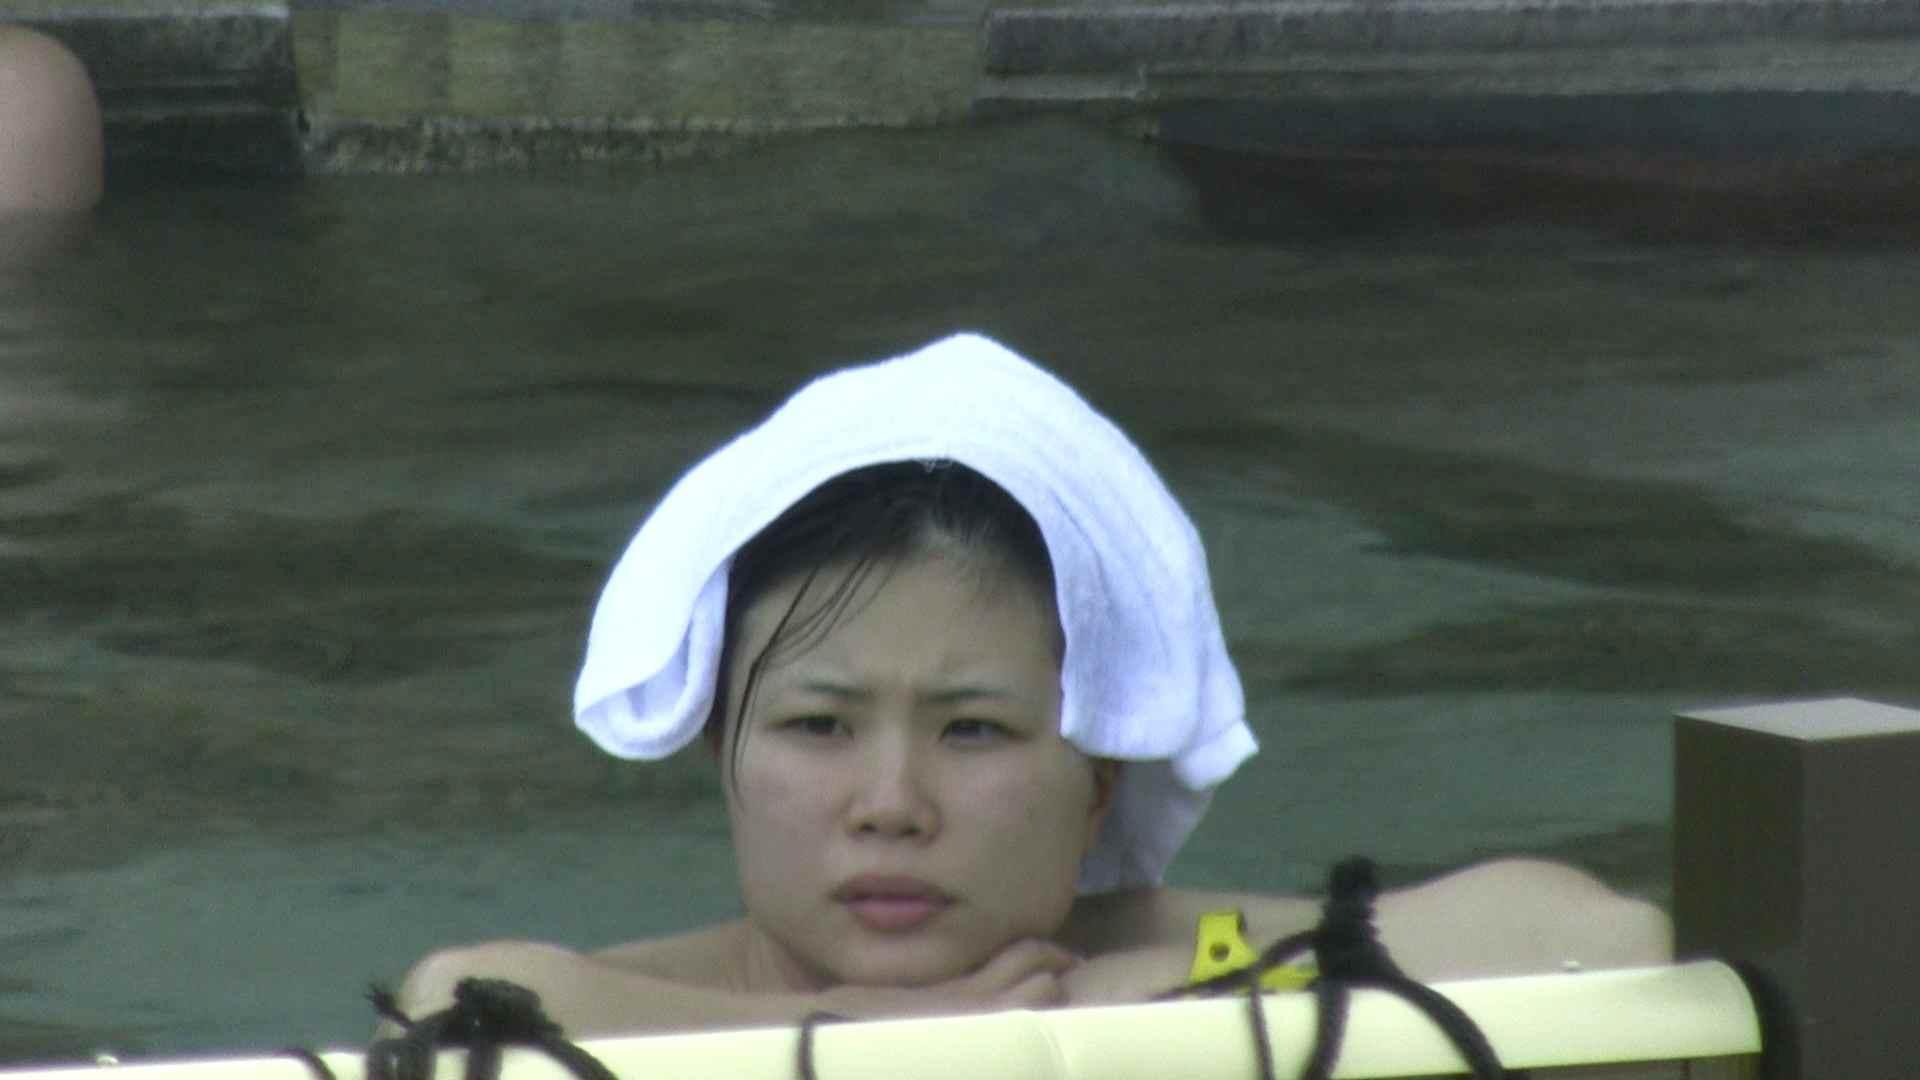 Aquaな露天風呂Vol.183 エッチな盗撮 ワレメ無修正動画無料 106pic 38